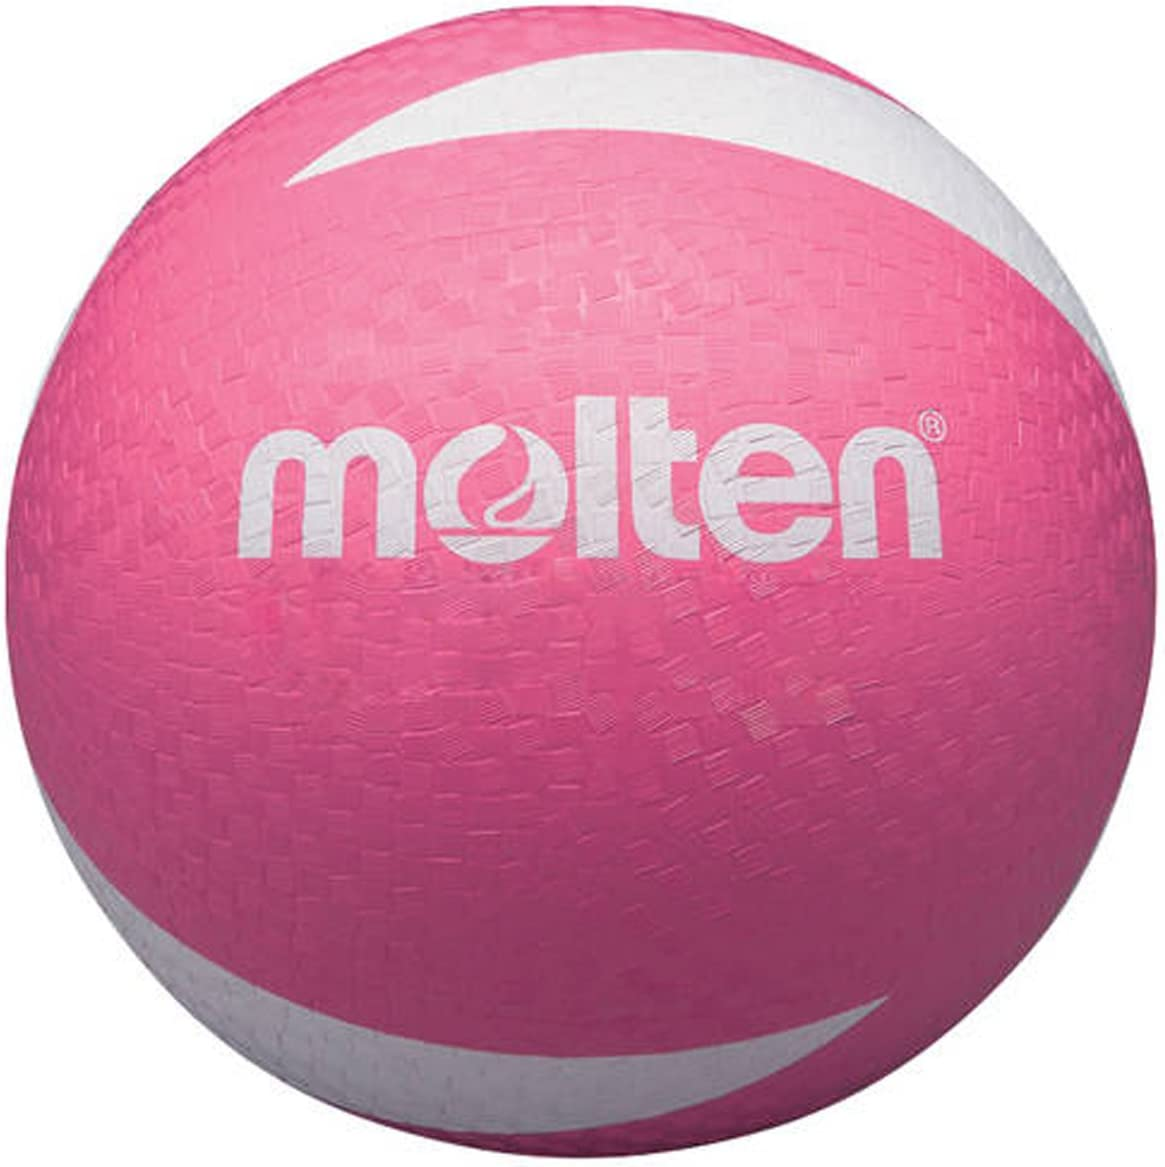 Molten Sv2p voleibol deportes pelota de goma anti-sting superficie ...